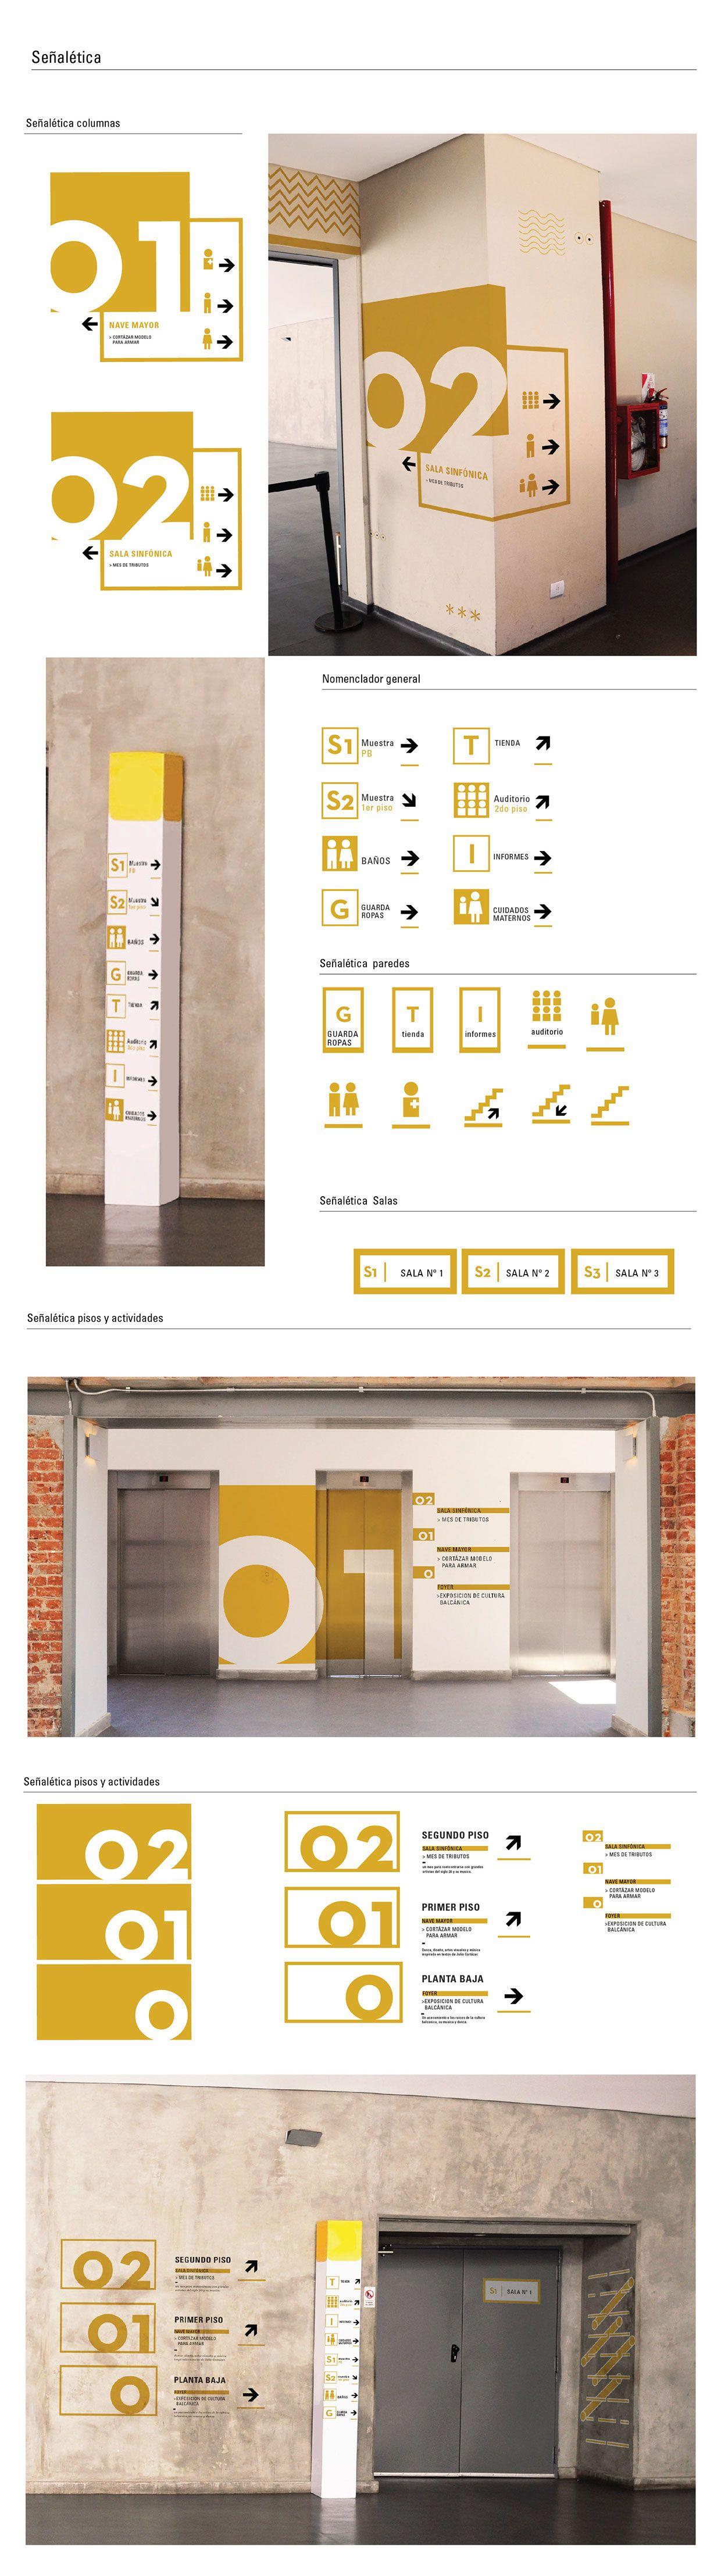 interior design poster - 1000+ images about Design, Poster Design & Graphic Design on ...